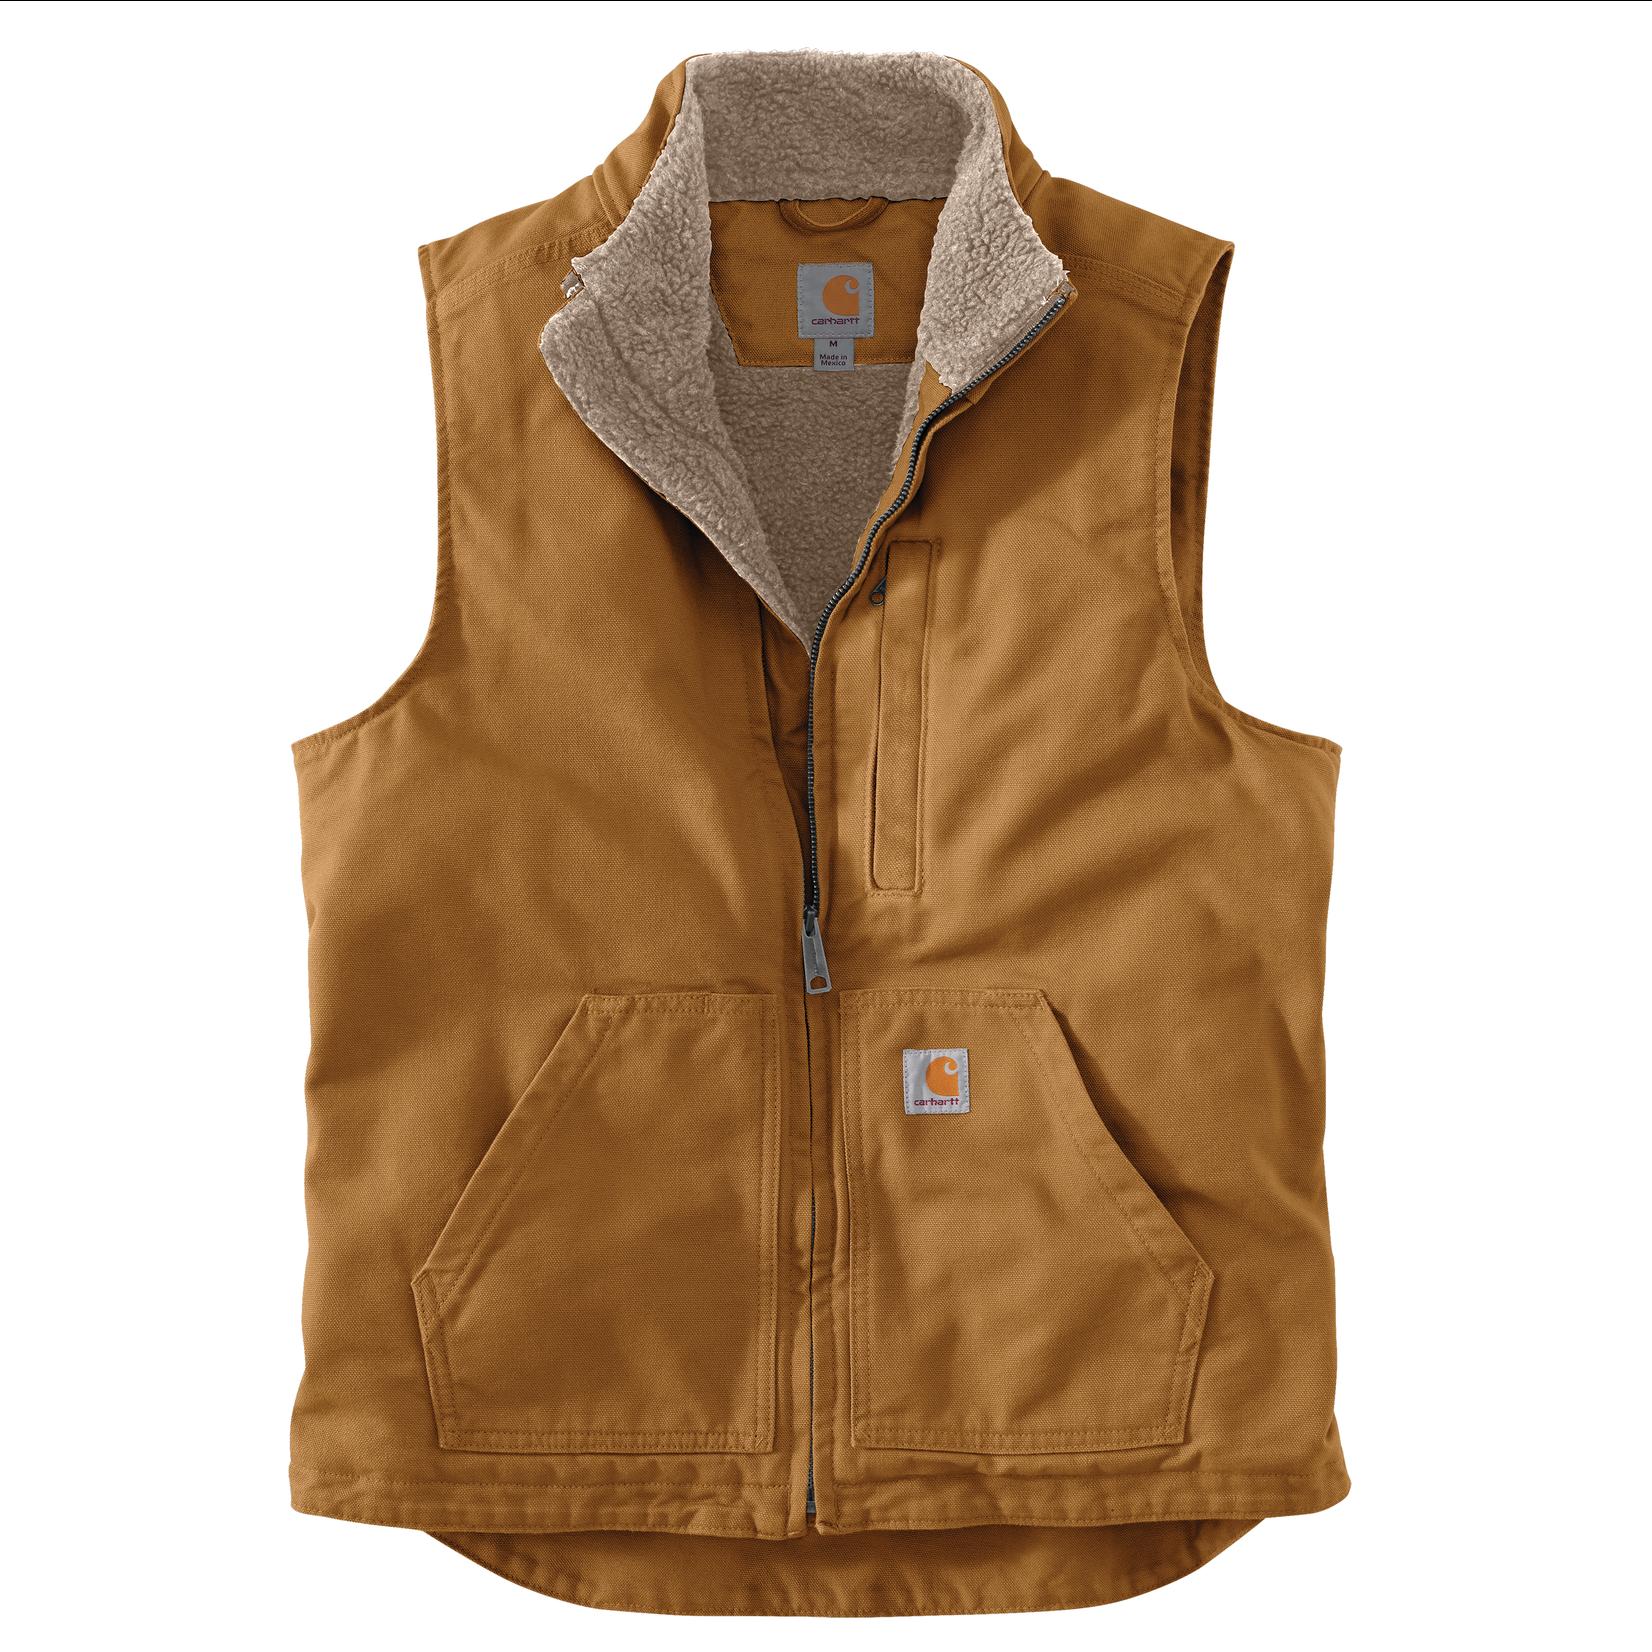 Carhartt Carhartt 104277 Loose Fit Washed Duck Sherpa Lined Mock-Neck Vest - BRN Carhartt Brown